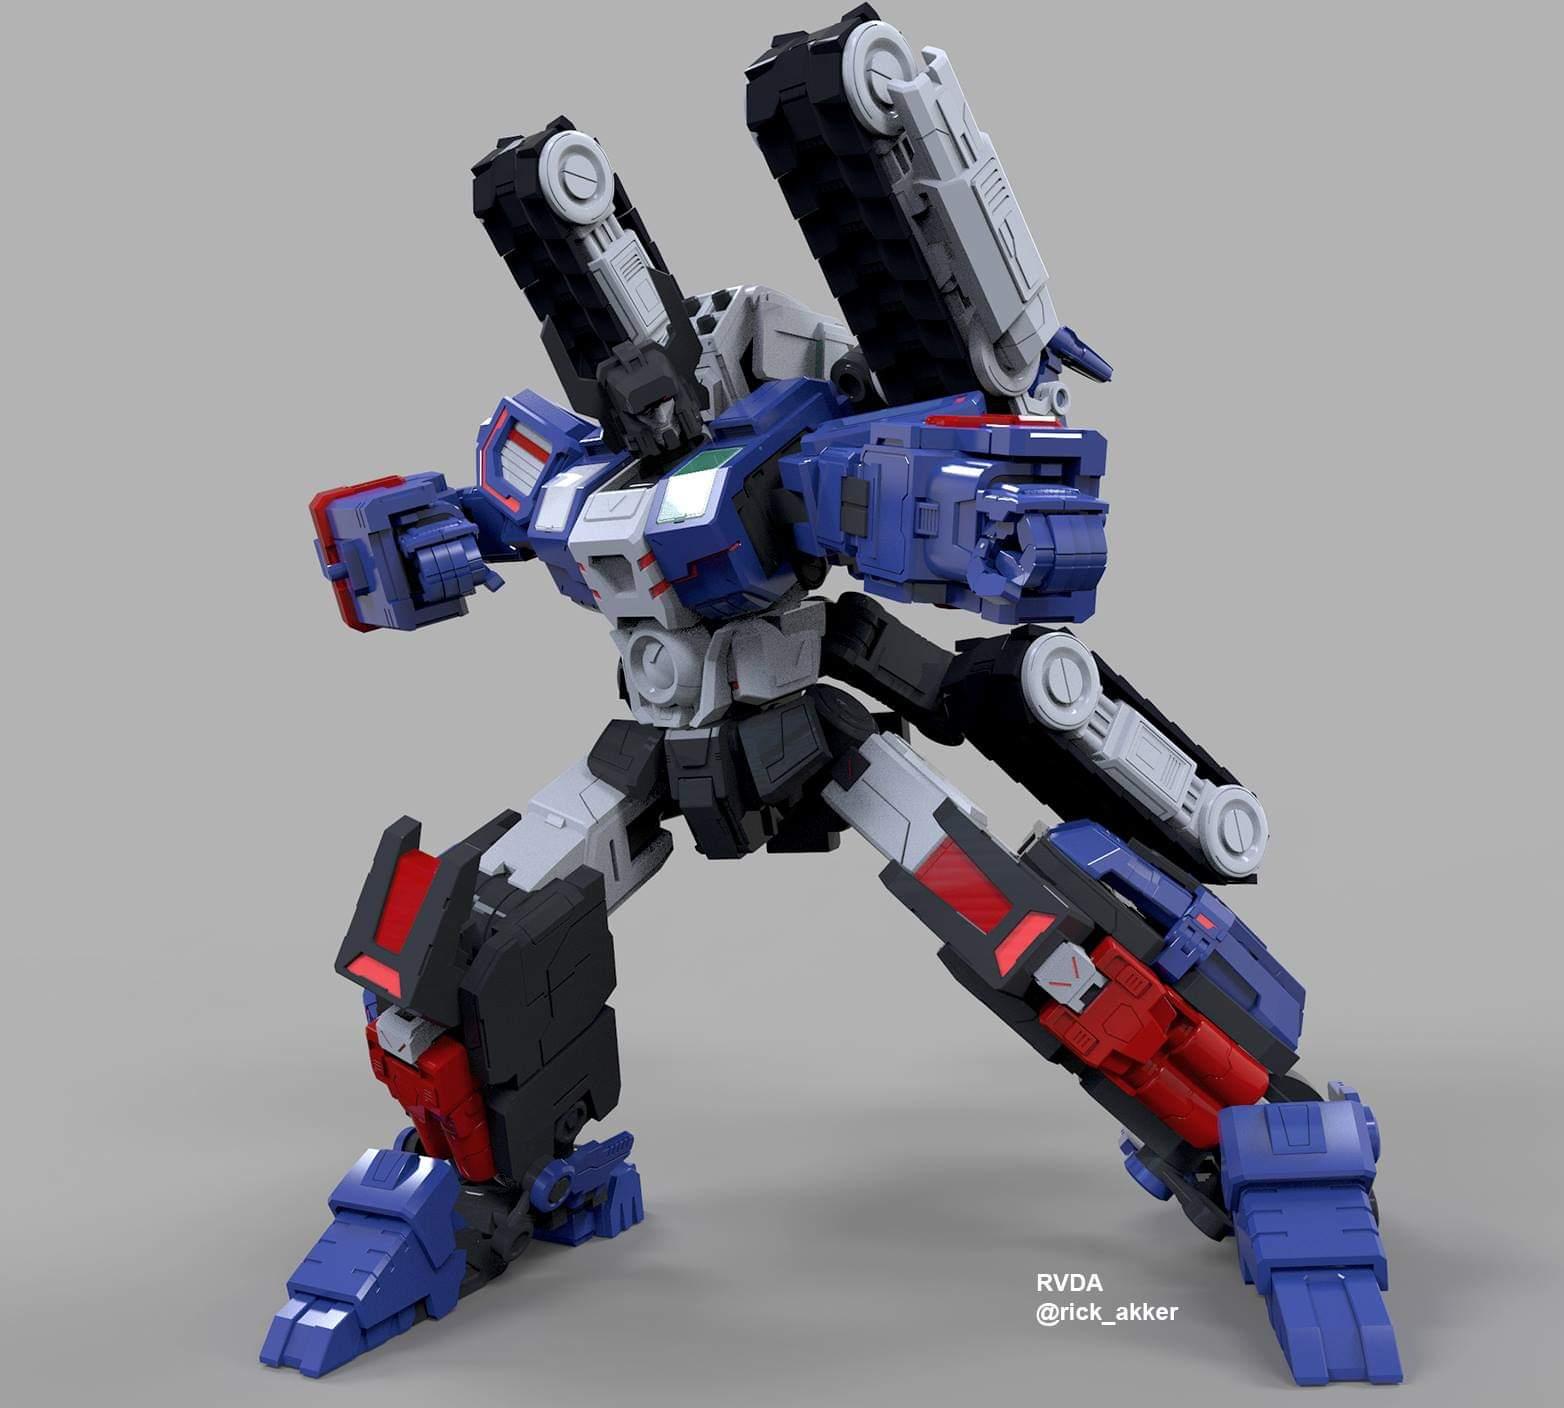 [Mastermind Creations] Produit Tiers - Reformatted R-50 Supermax - aka Fortress/Forteresse Maximus des BD IDW TKMtGA3r_o